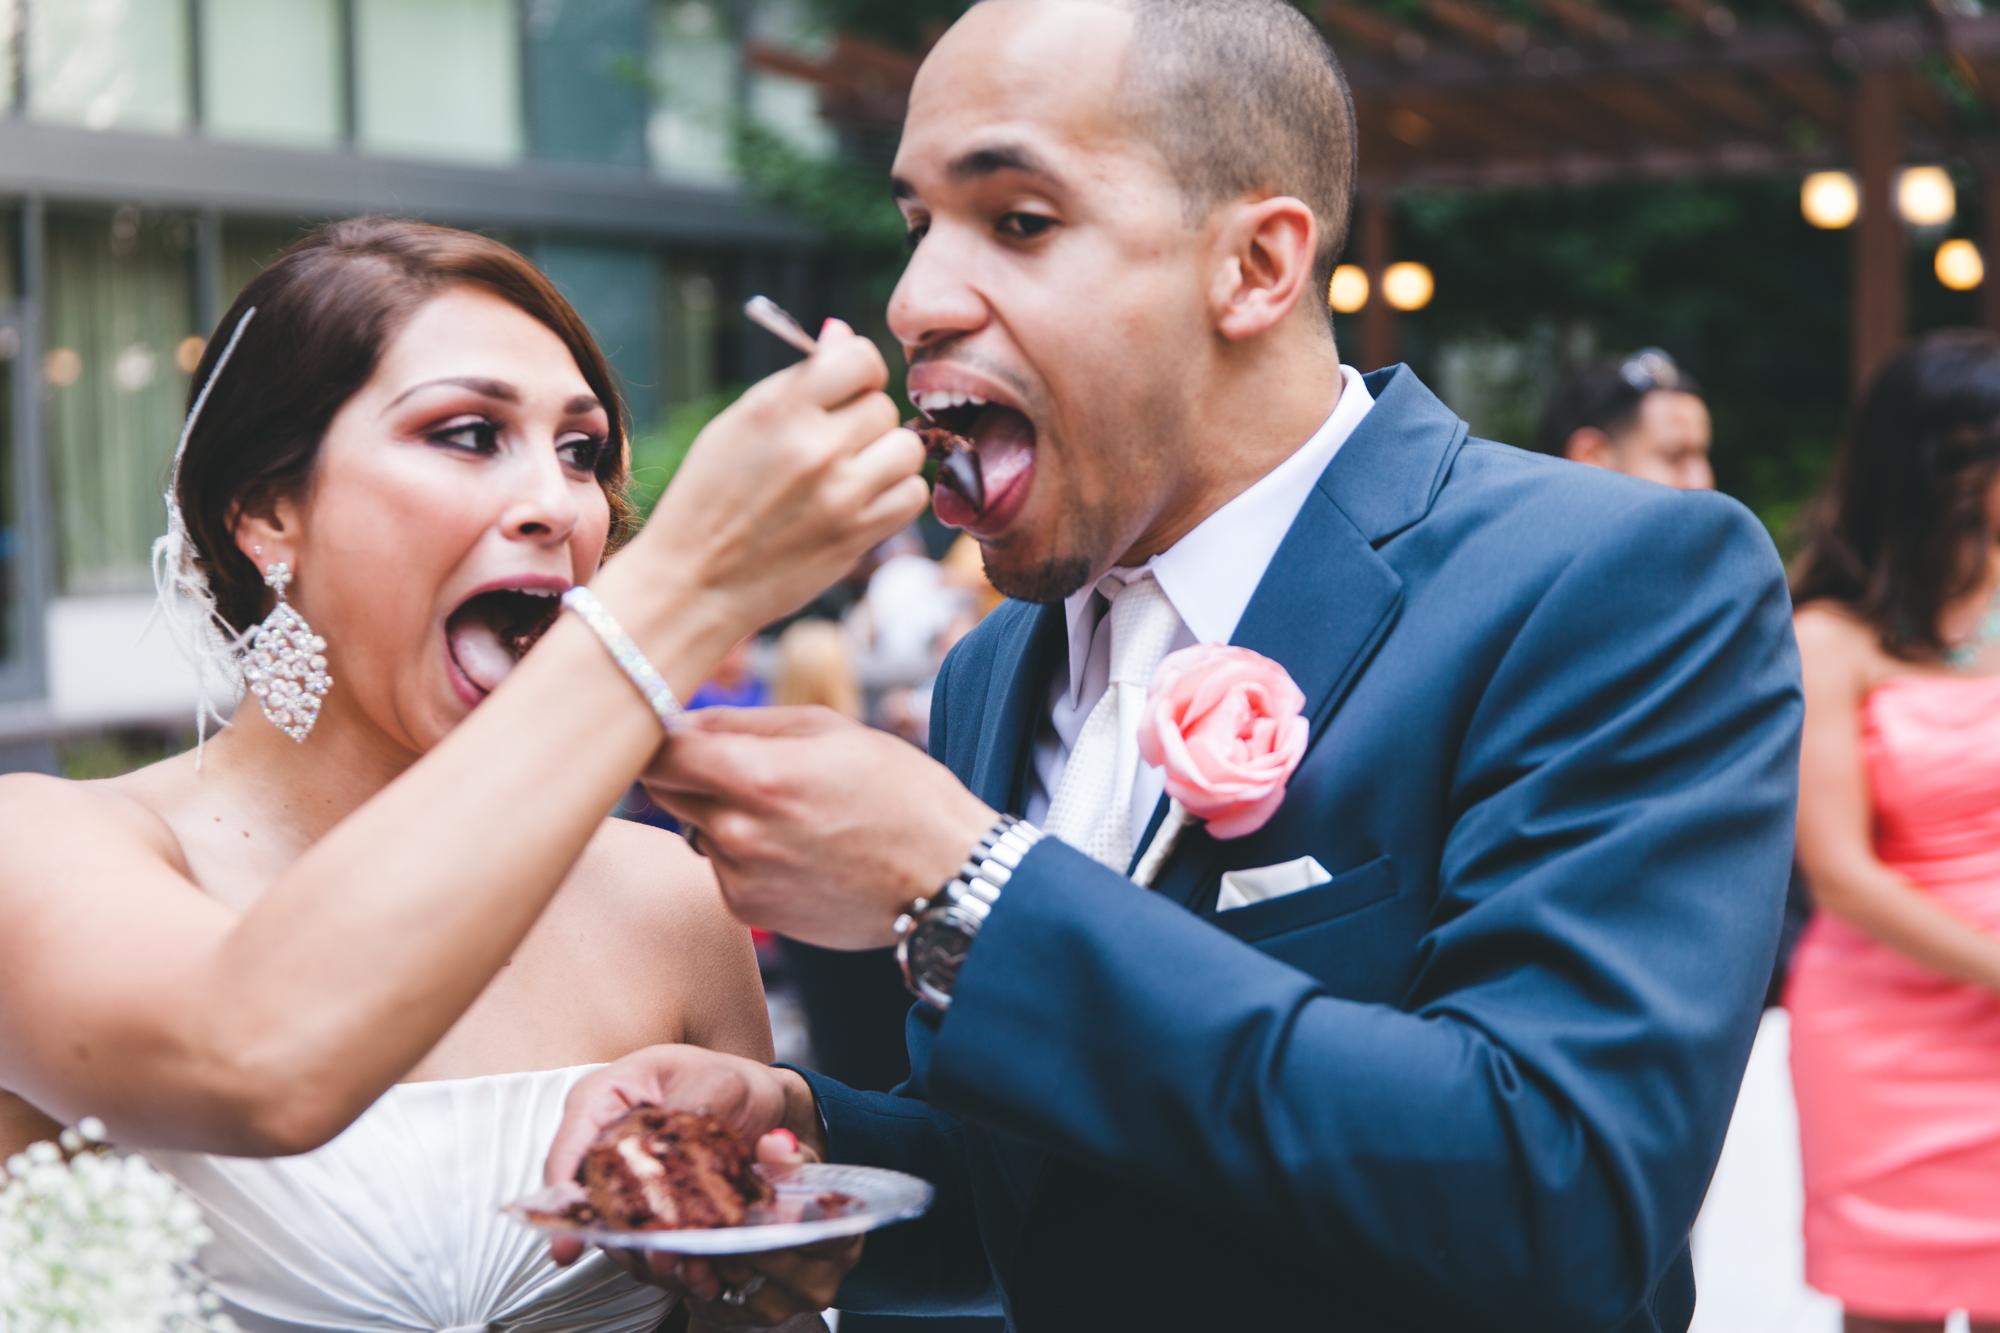 PriscillaJeffrey-Central-Park-Wedding-Elopement-Photography-NYC-56.jpg